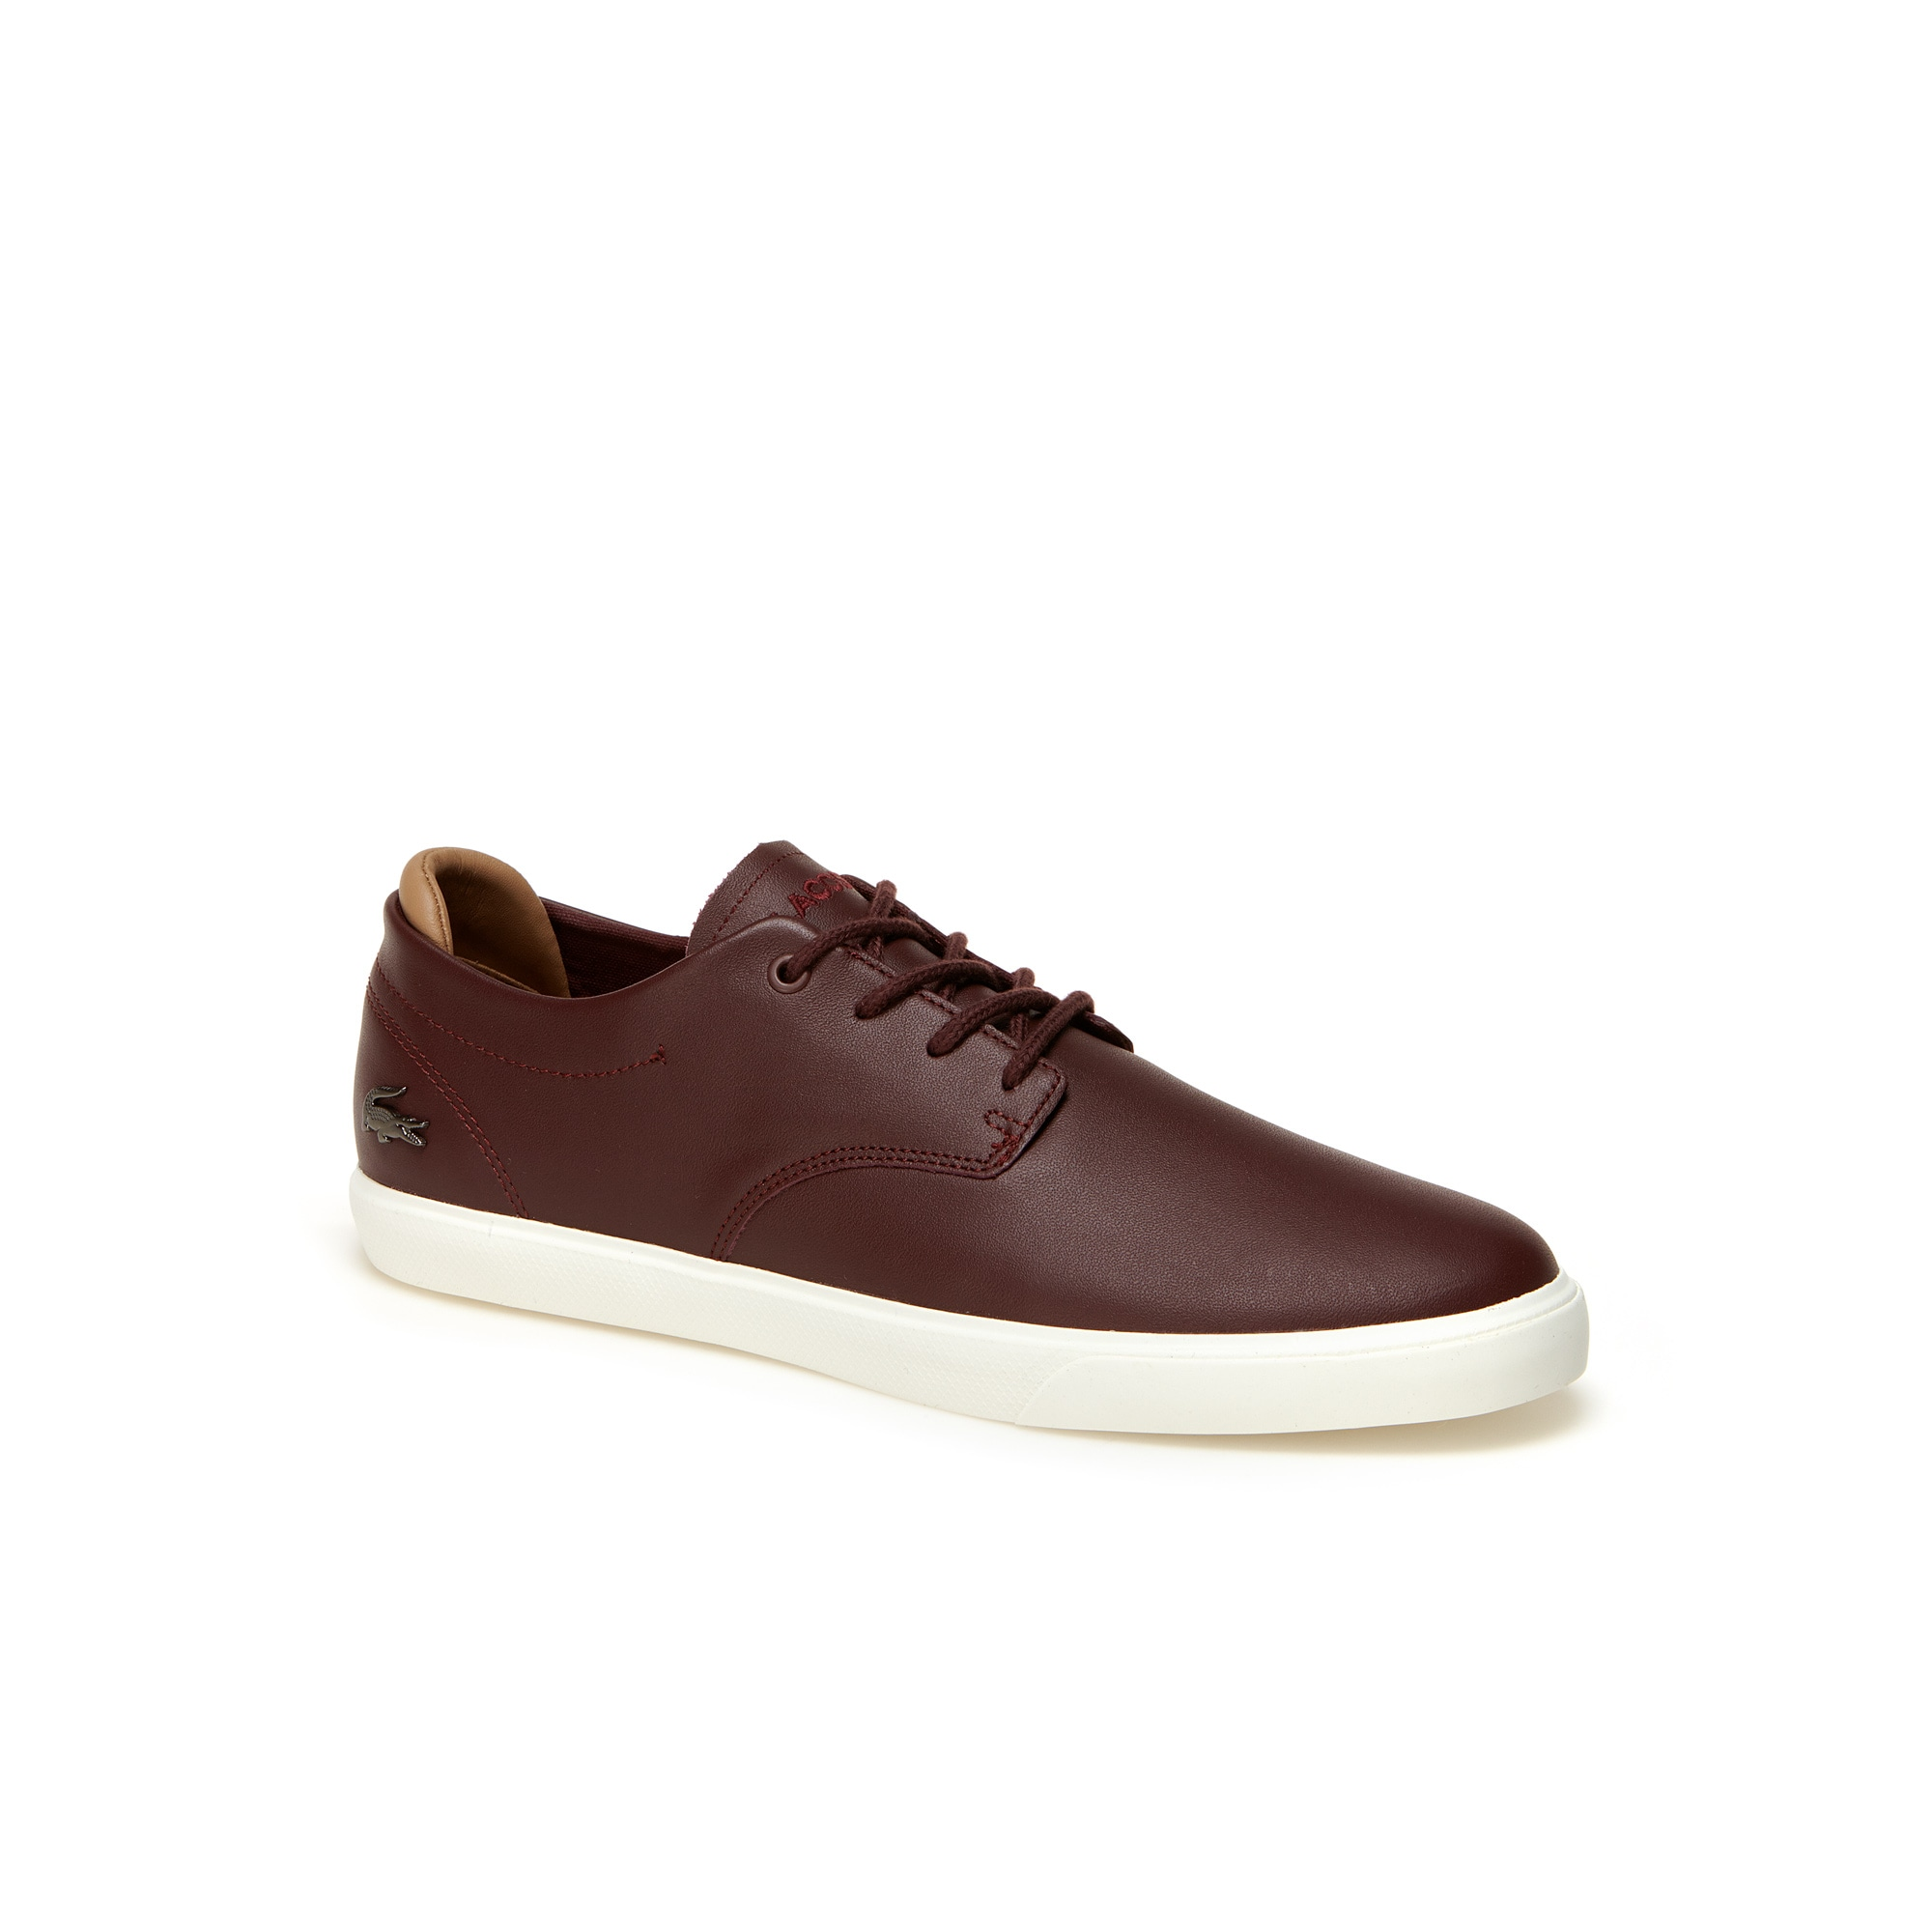 Men's Espere Nappa Leather Sneakers